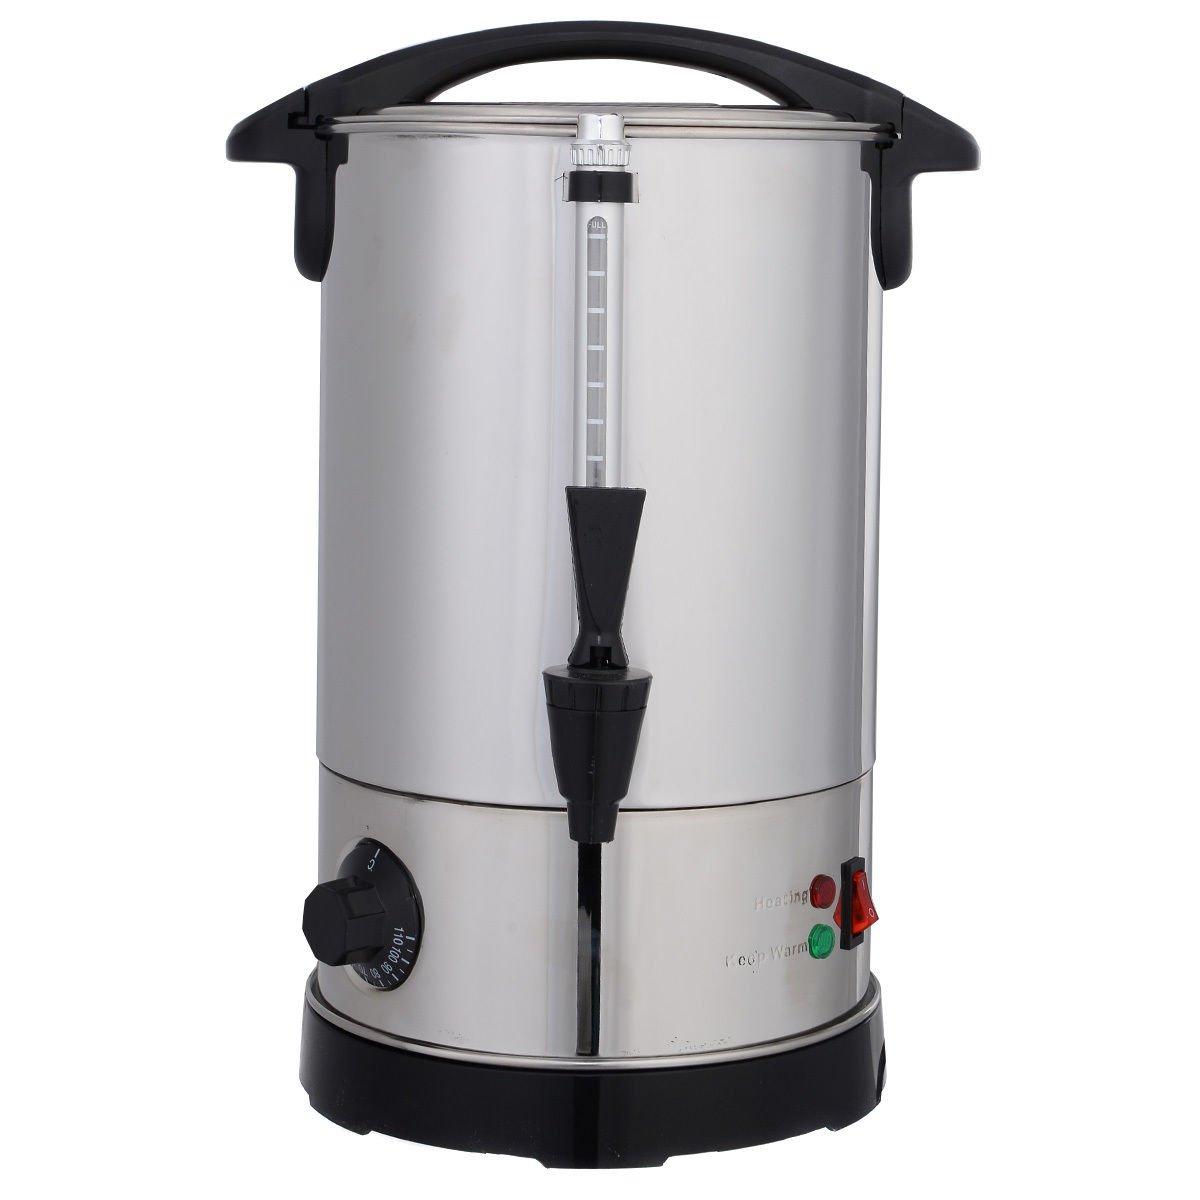 Stainless Steel 6 Quart Electric Water Boiler Warmer Hot Water Kettle Dispenser